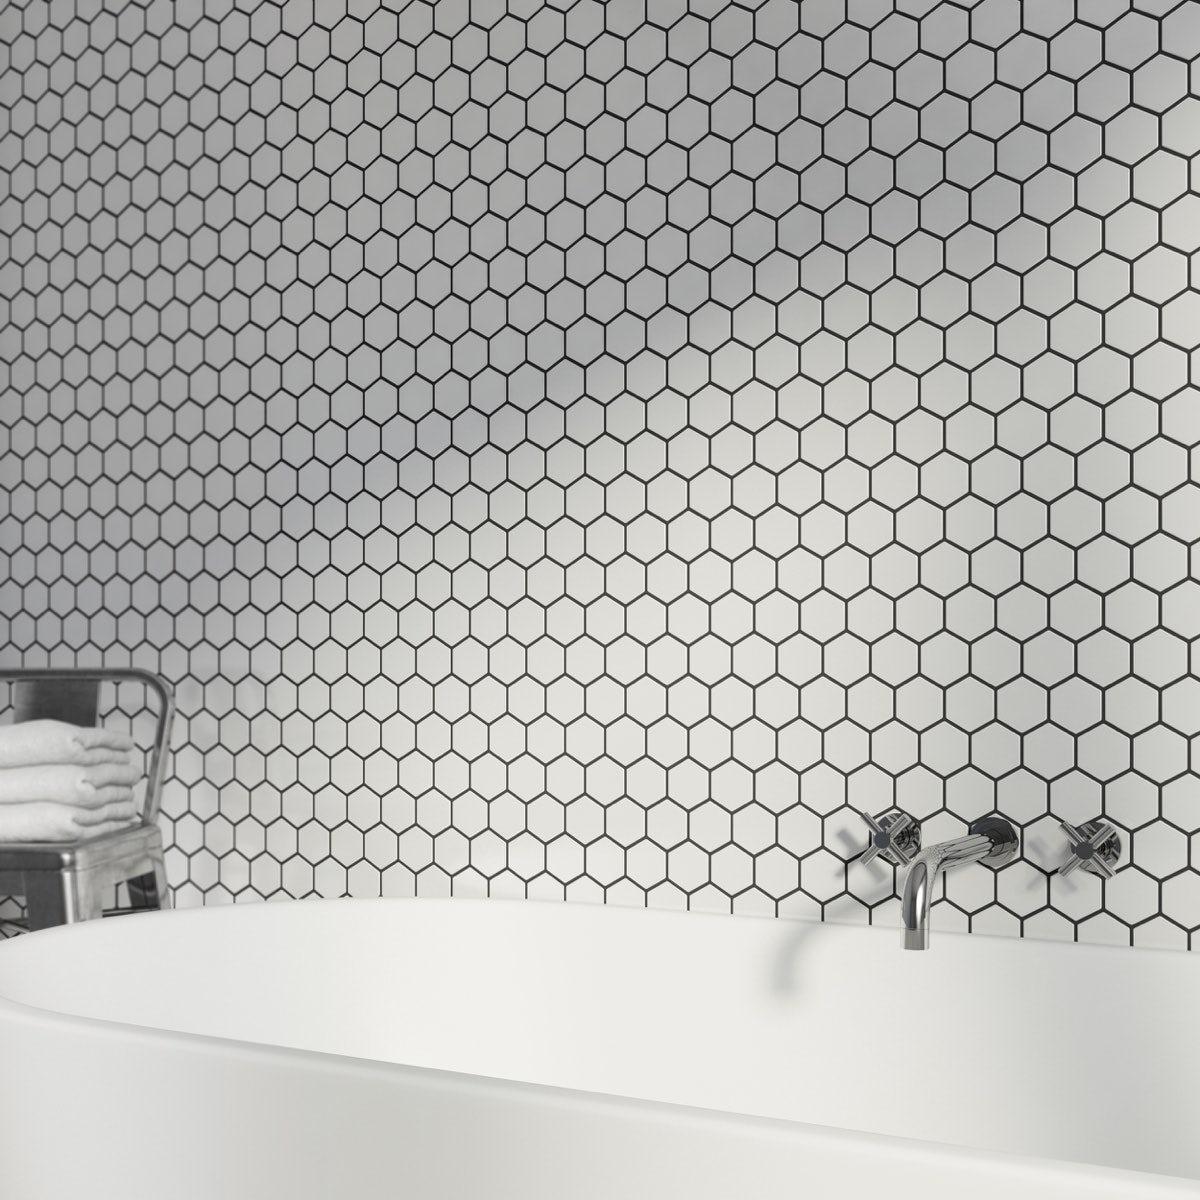 British Ceramic Tile Mosaic Hex White Gloss Tile 300mm X 300mm 1 Sheet